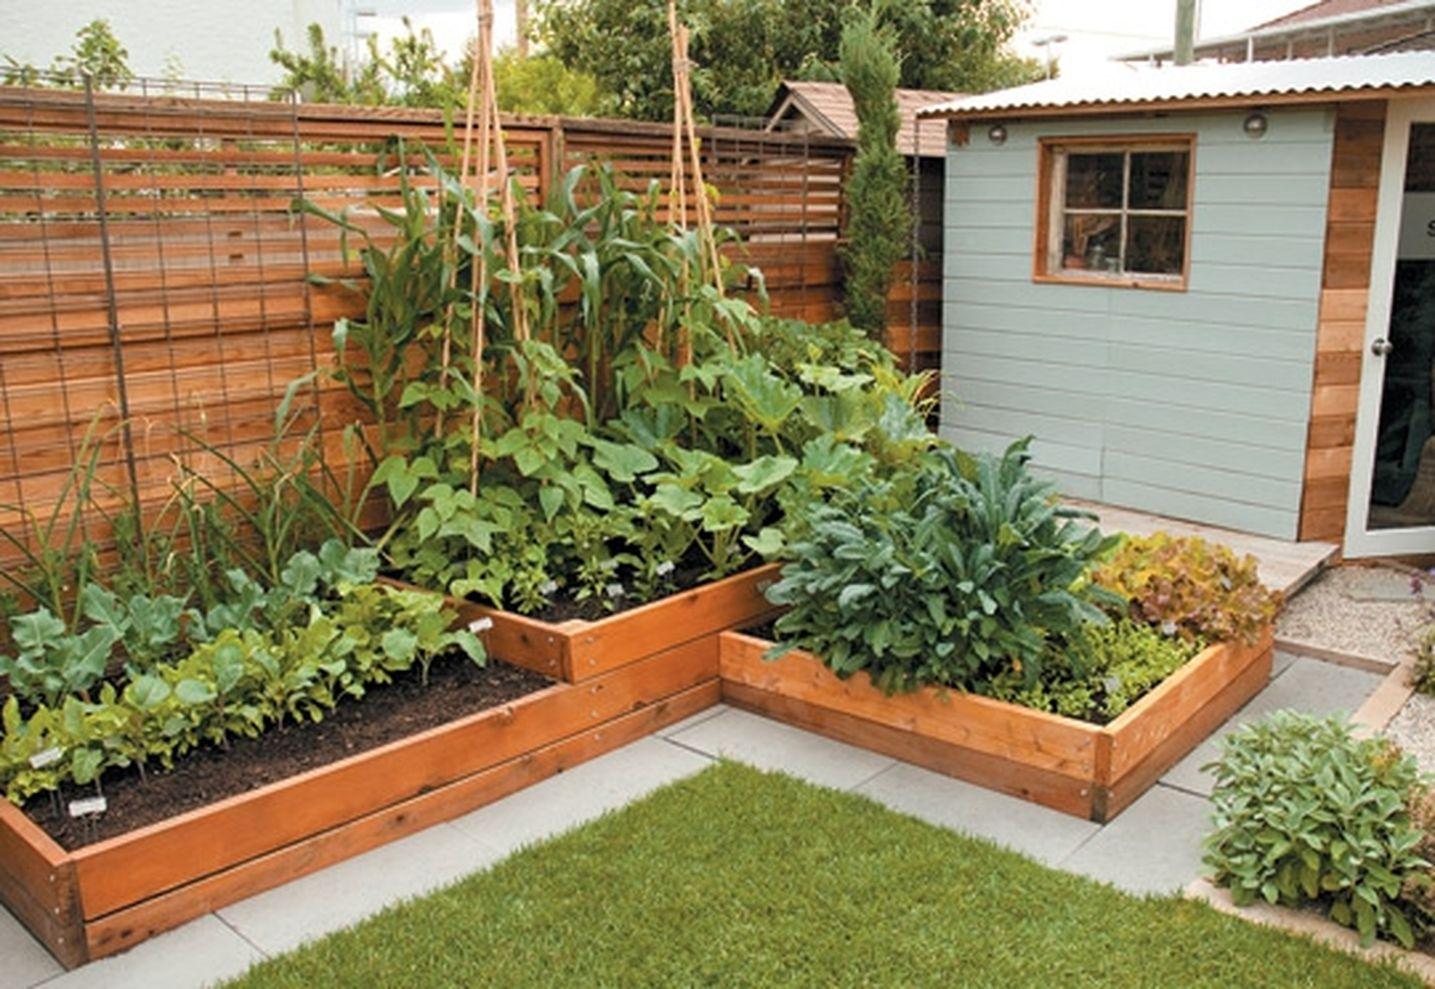 Elegant Affordable Backyard Vegetable Garden Designs Ideas 01